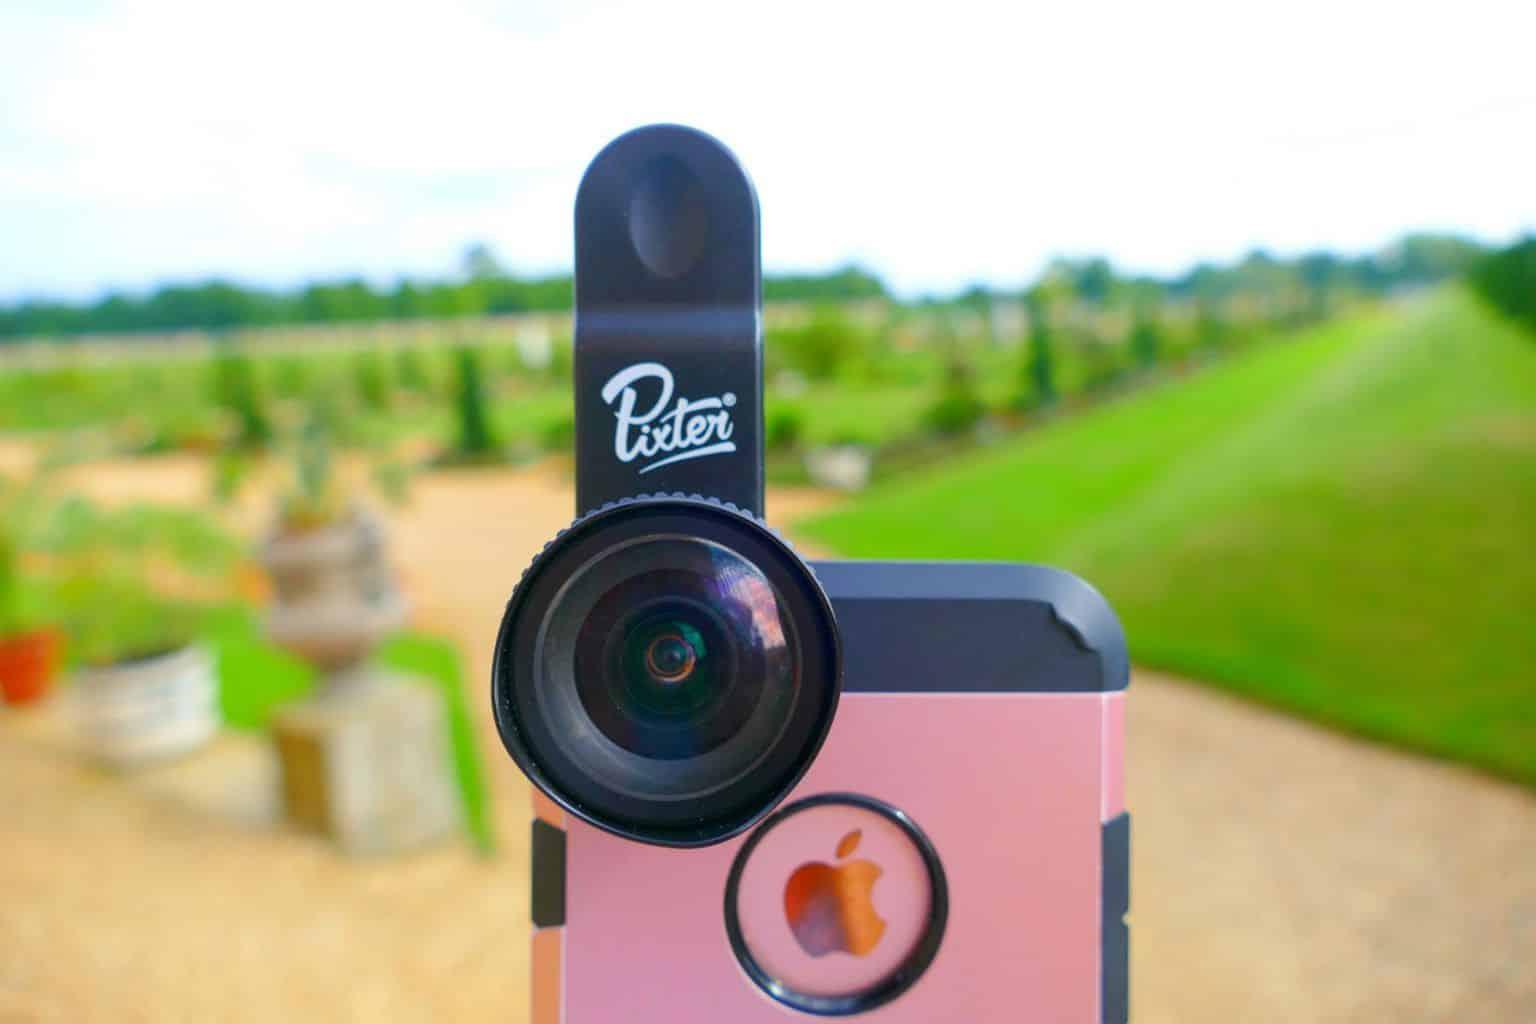 Pixter review - the new smartphone camera lens!